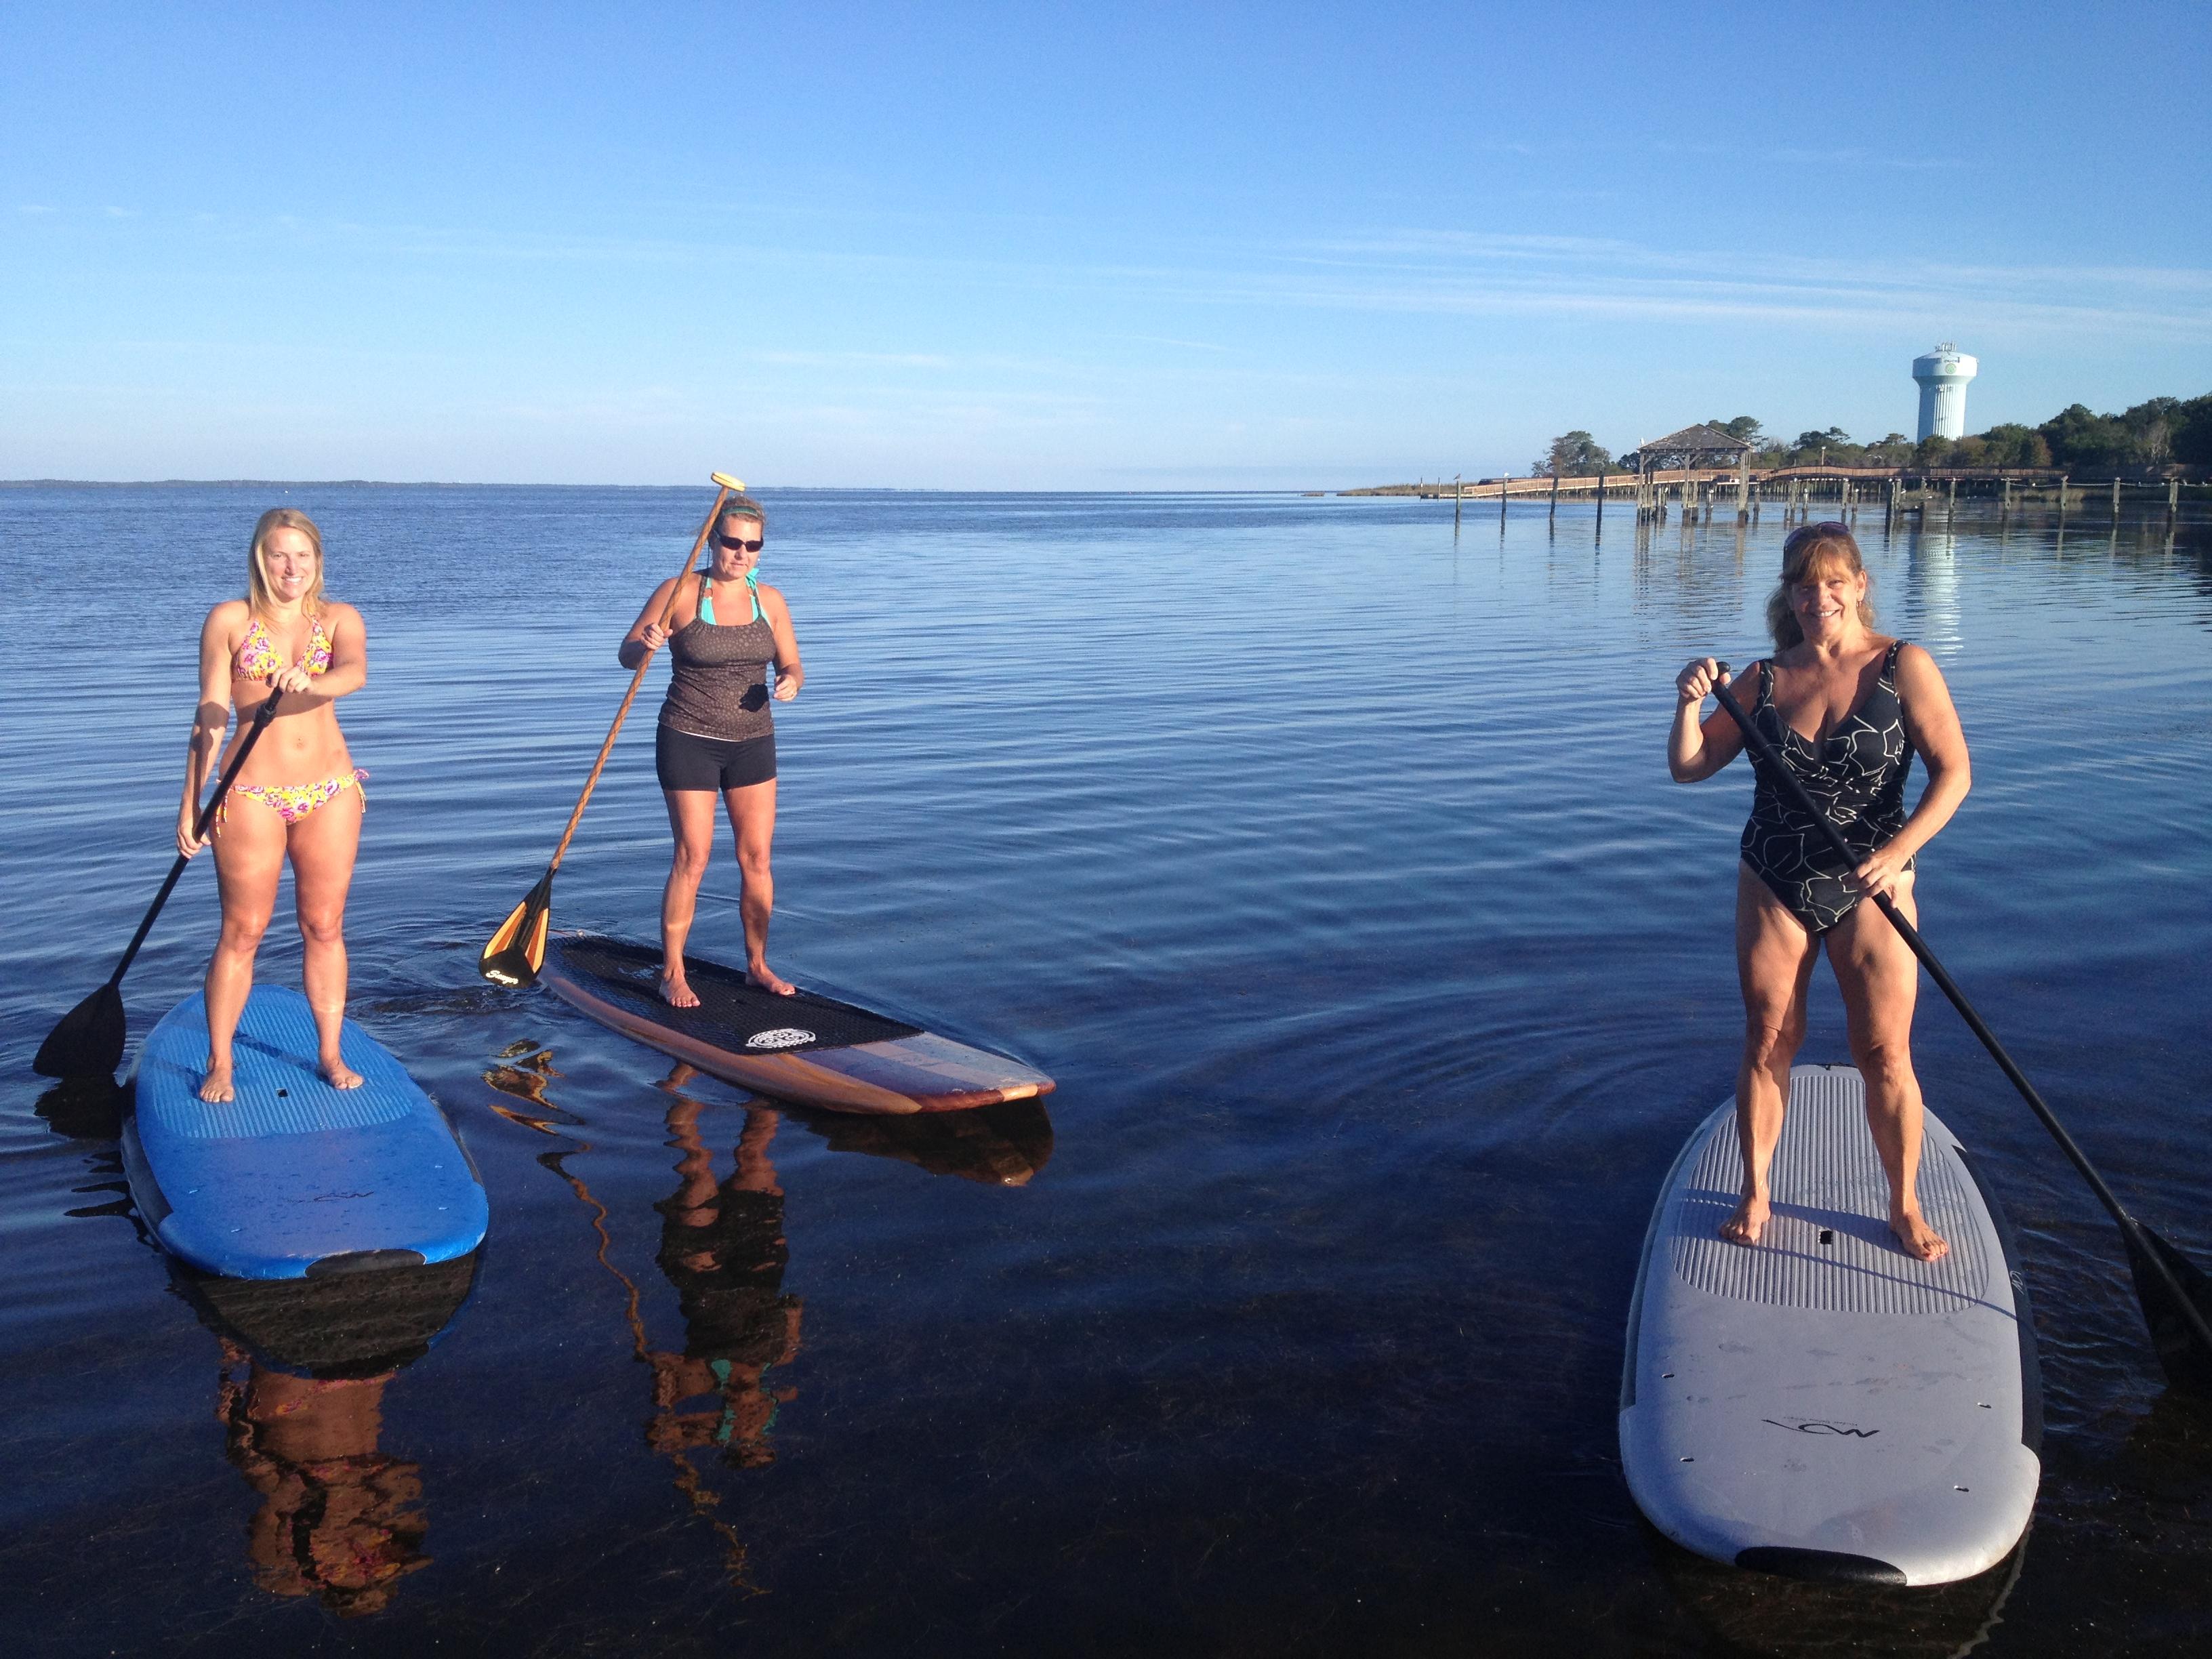 surfpics/paddleboardgirls1.JPG